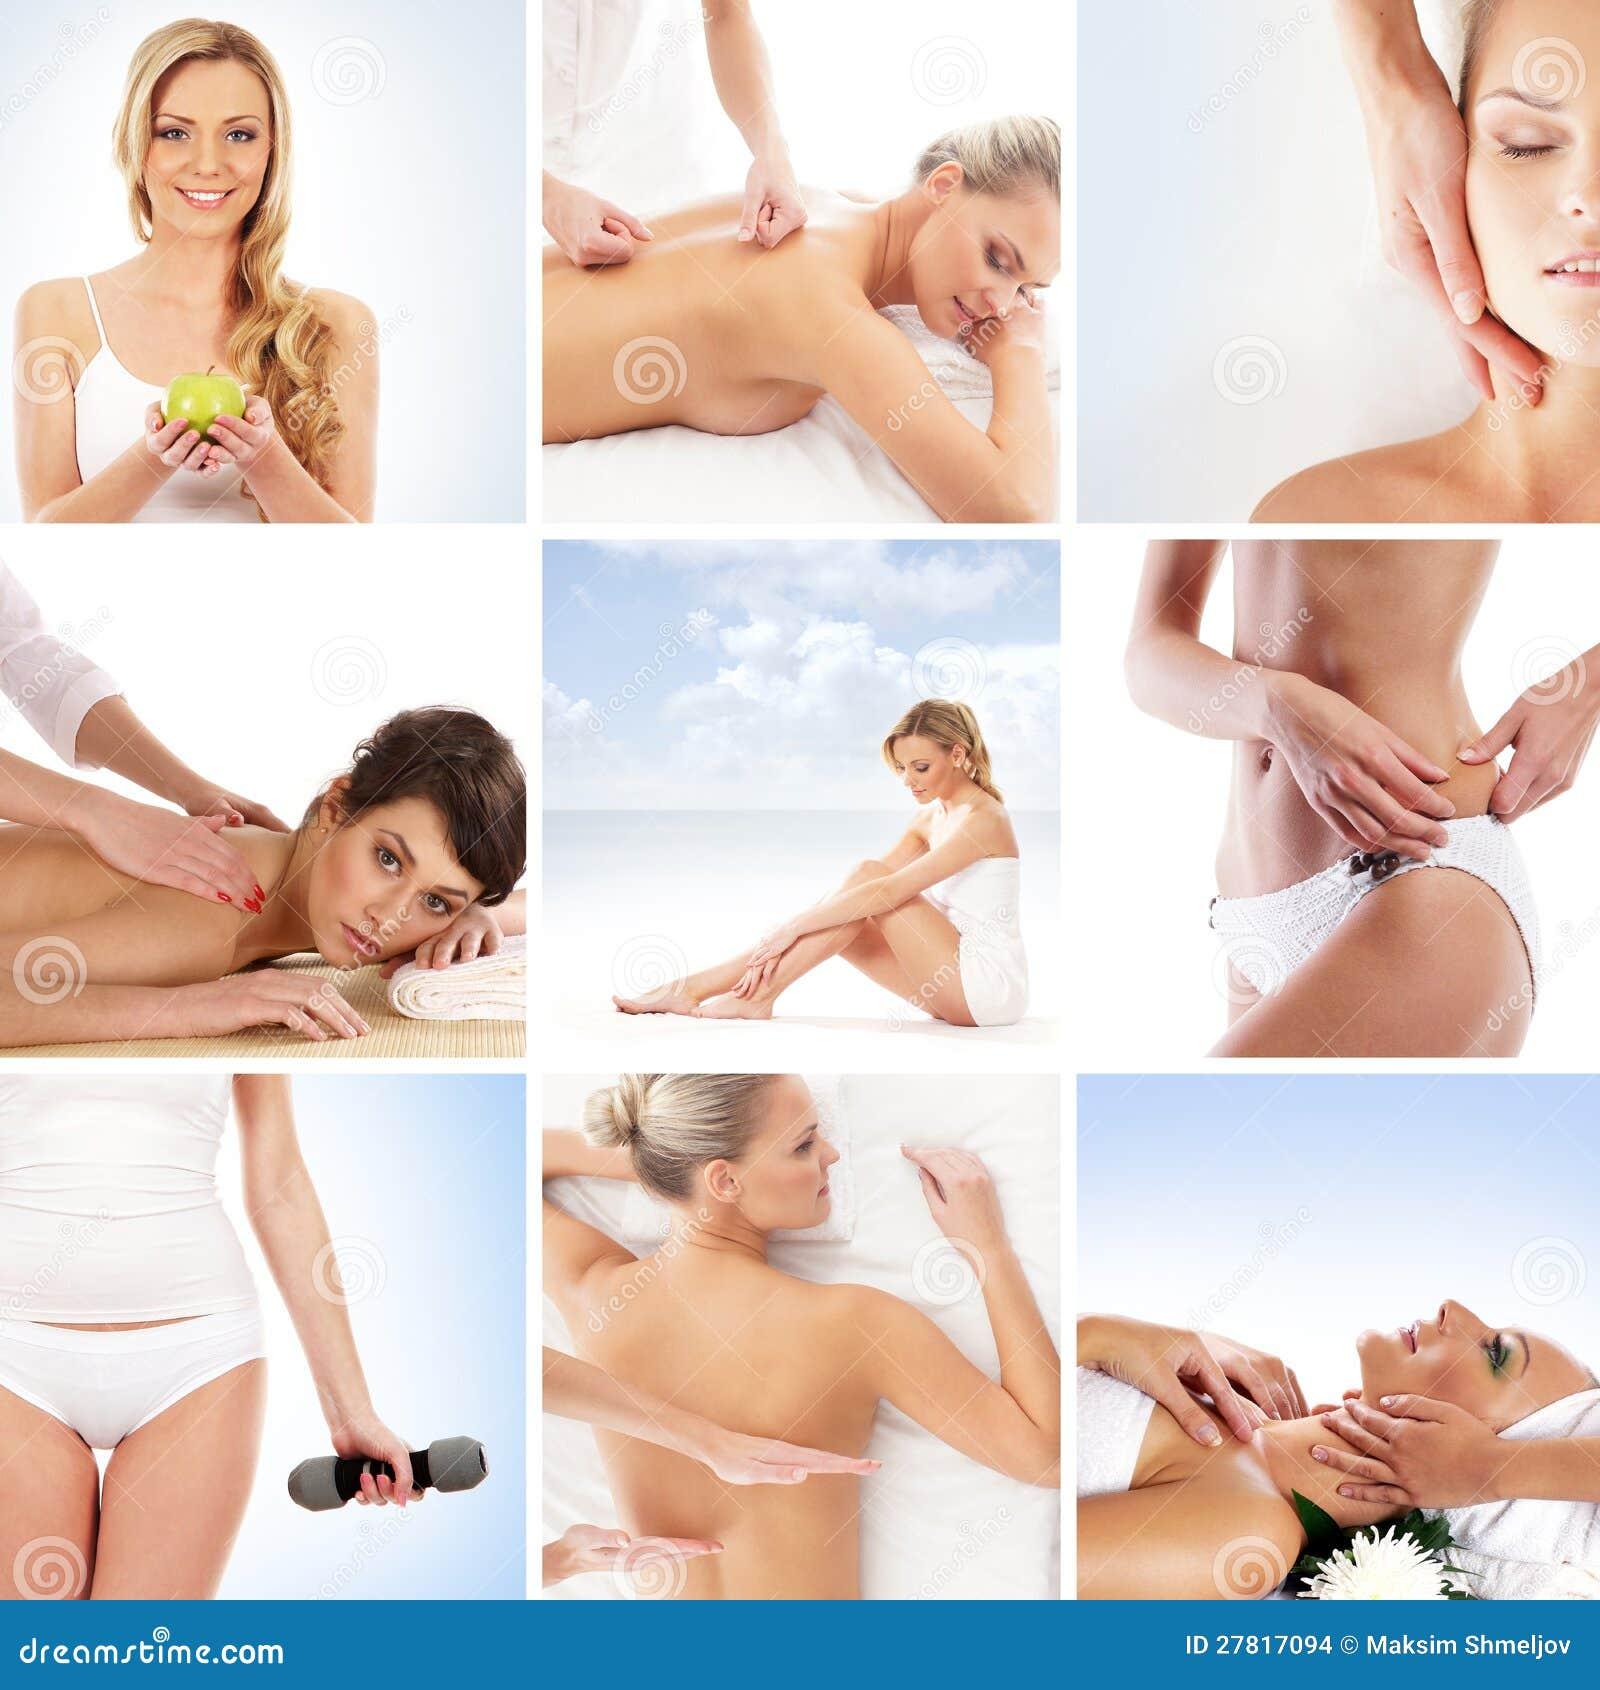 masajes a nenas hembra